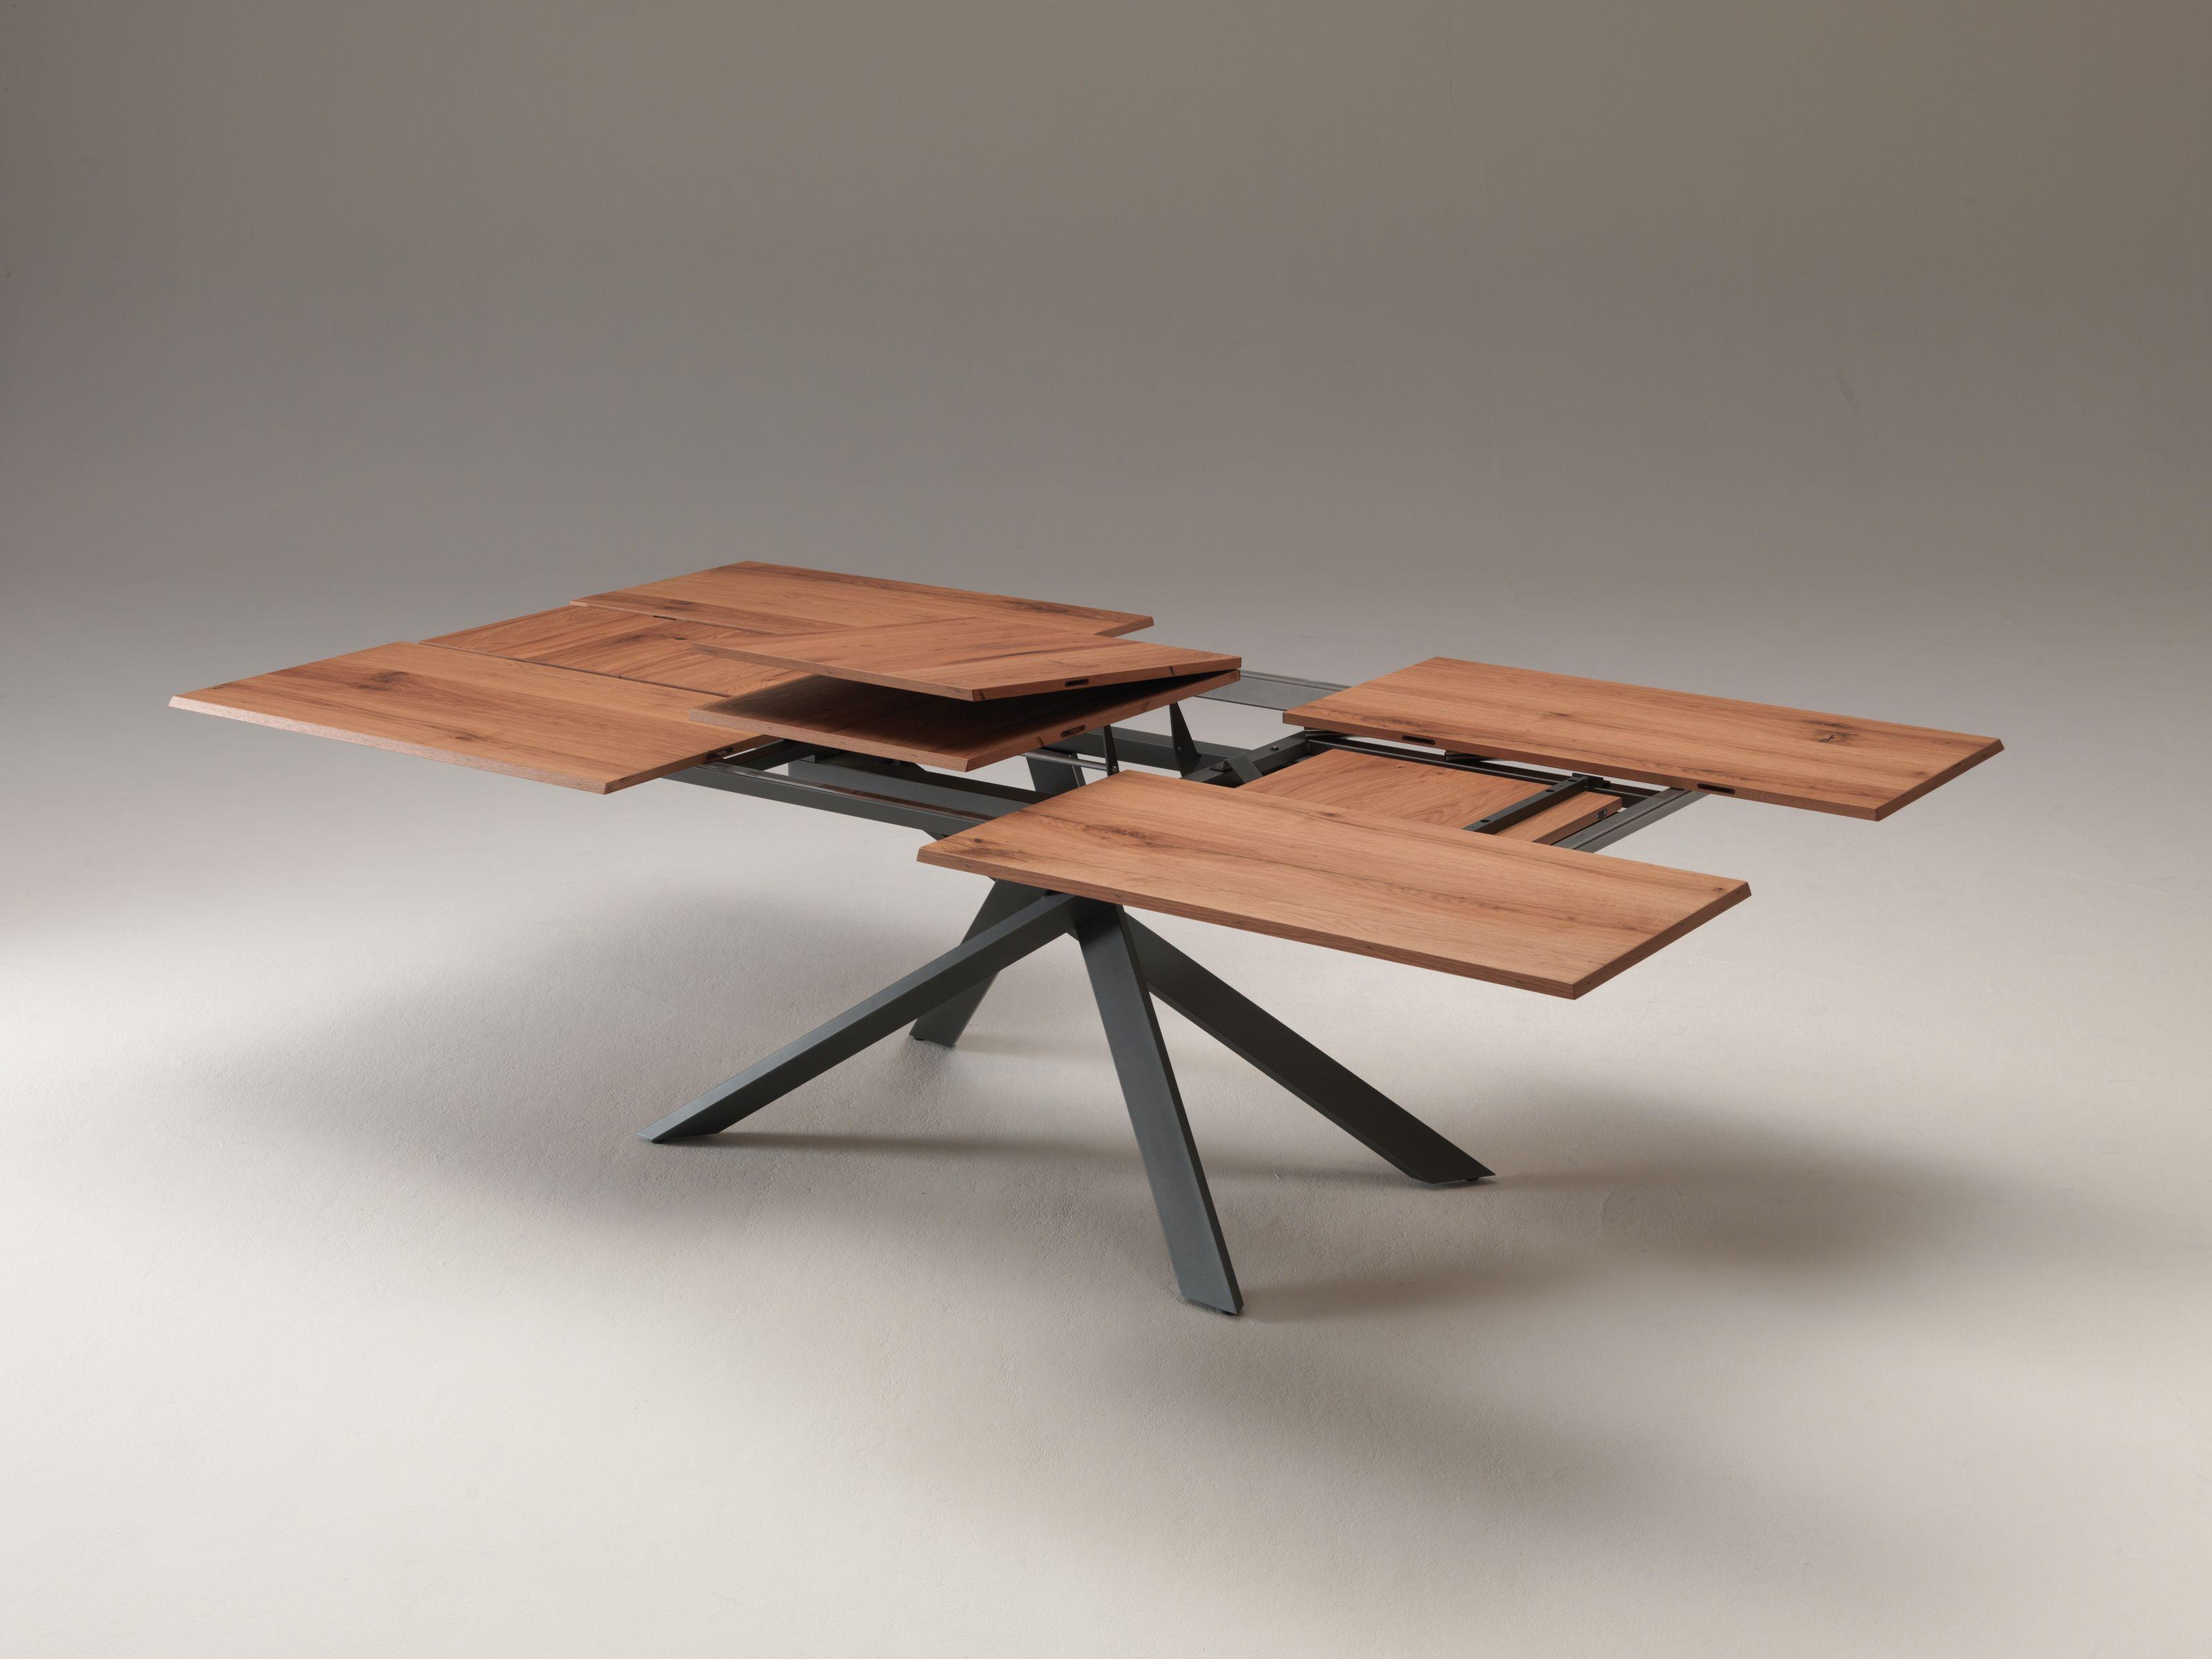 Telo3w Glass Coffee Table Oval Glass Coffee Table Glass Coffee Table For Sale [ 811 x 1200 Pixel ]